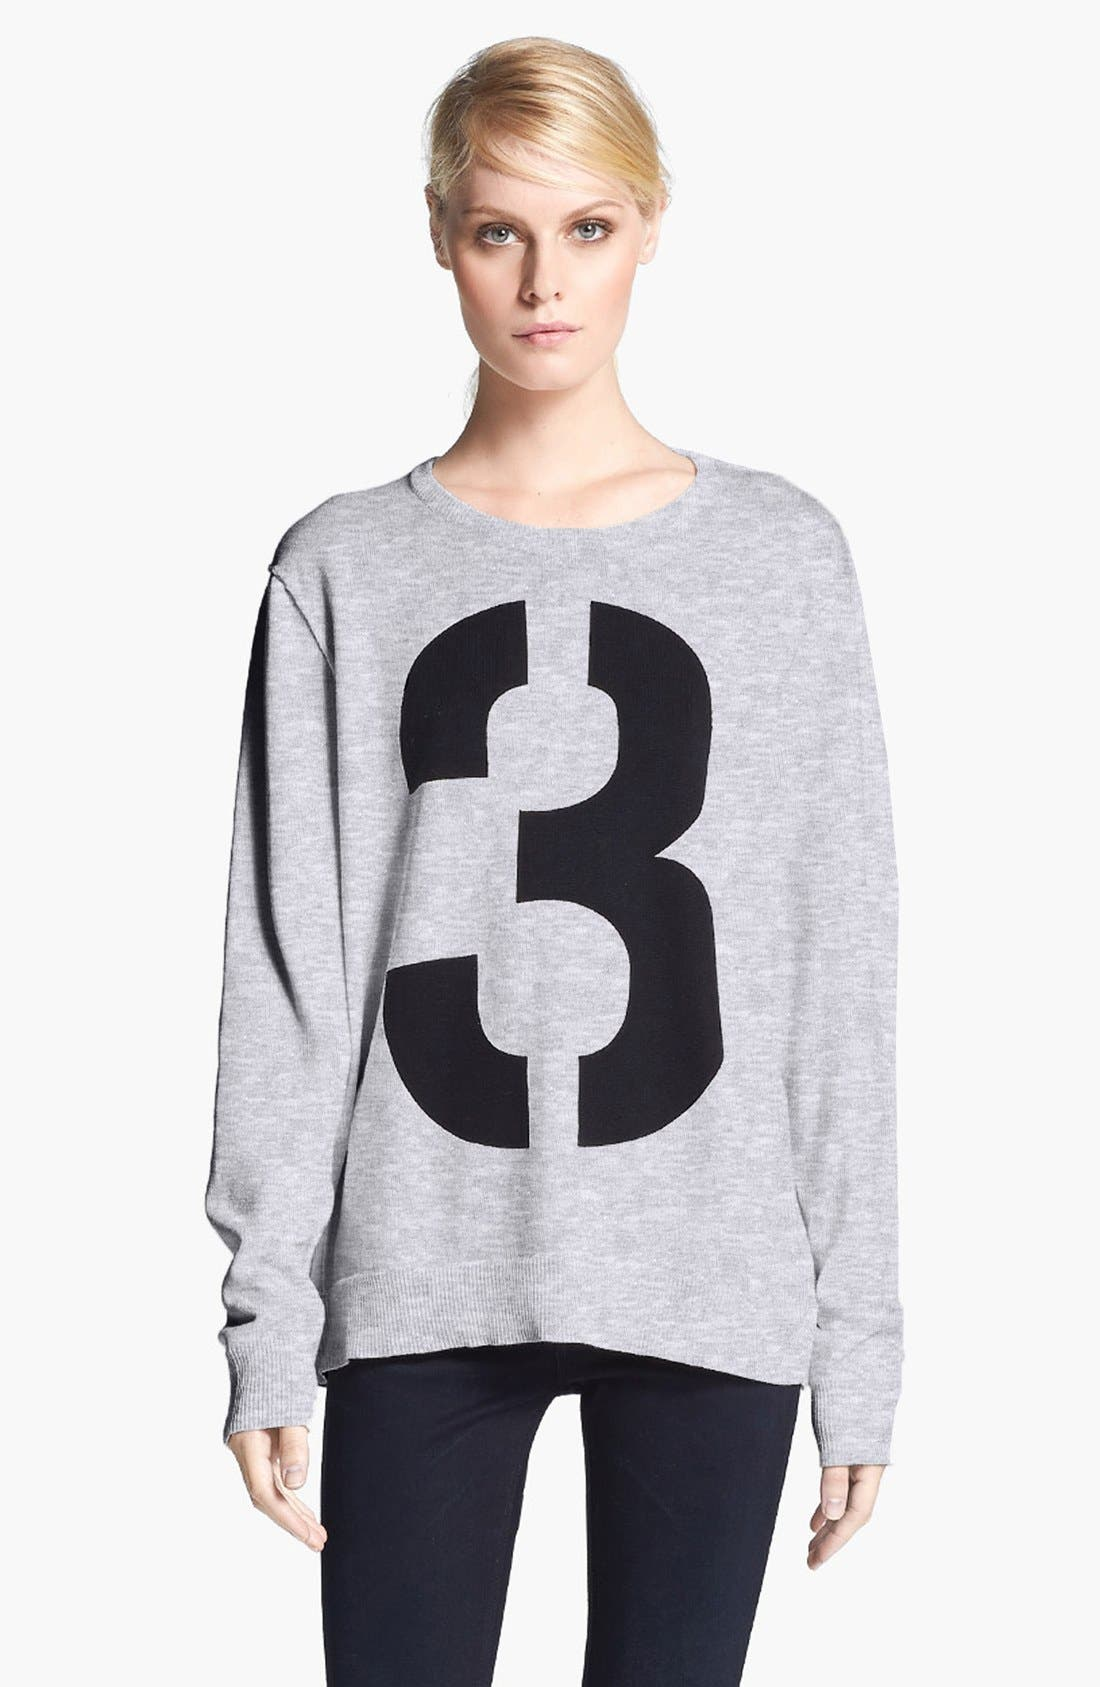 Main Image - rag & bone 'Numbers' Crewneck Sweatshirt